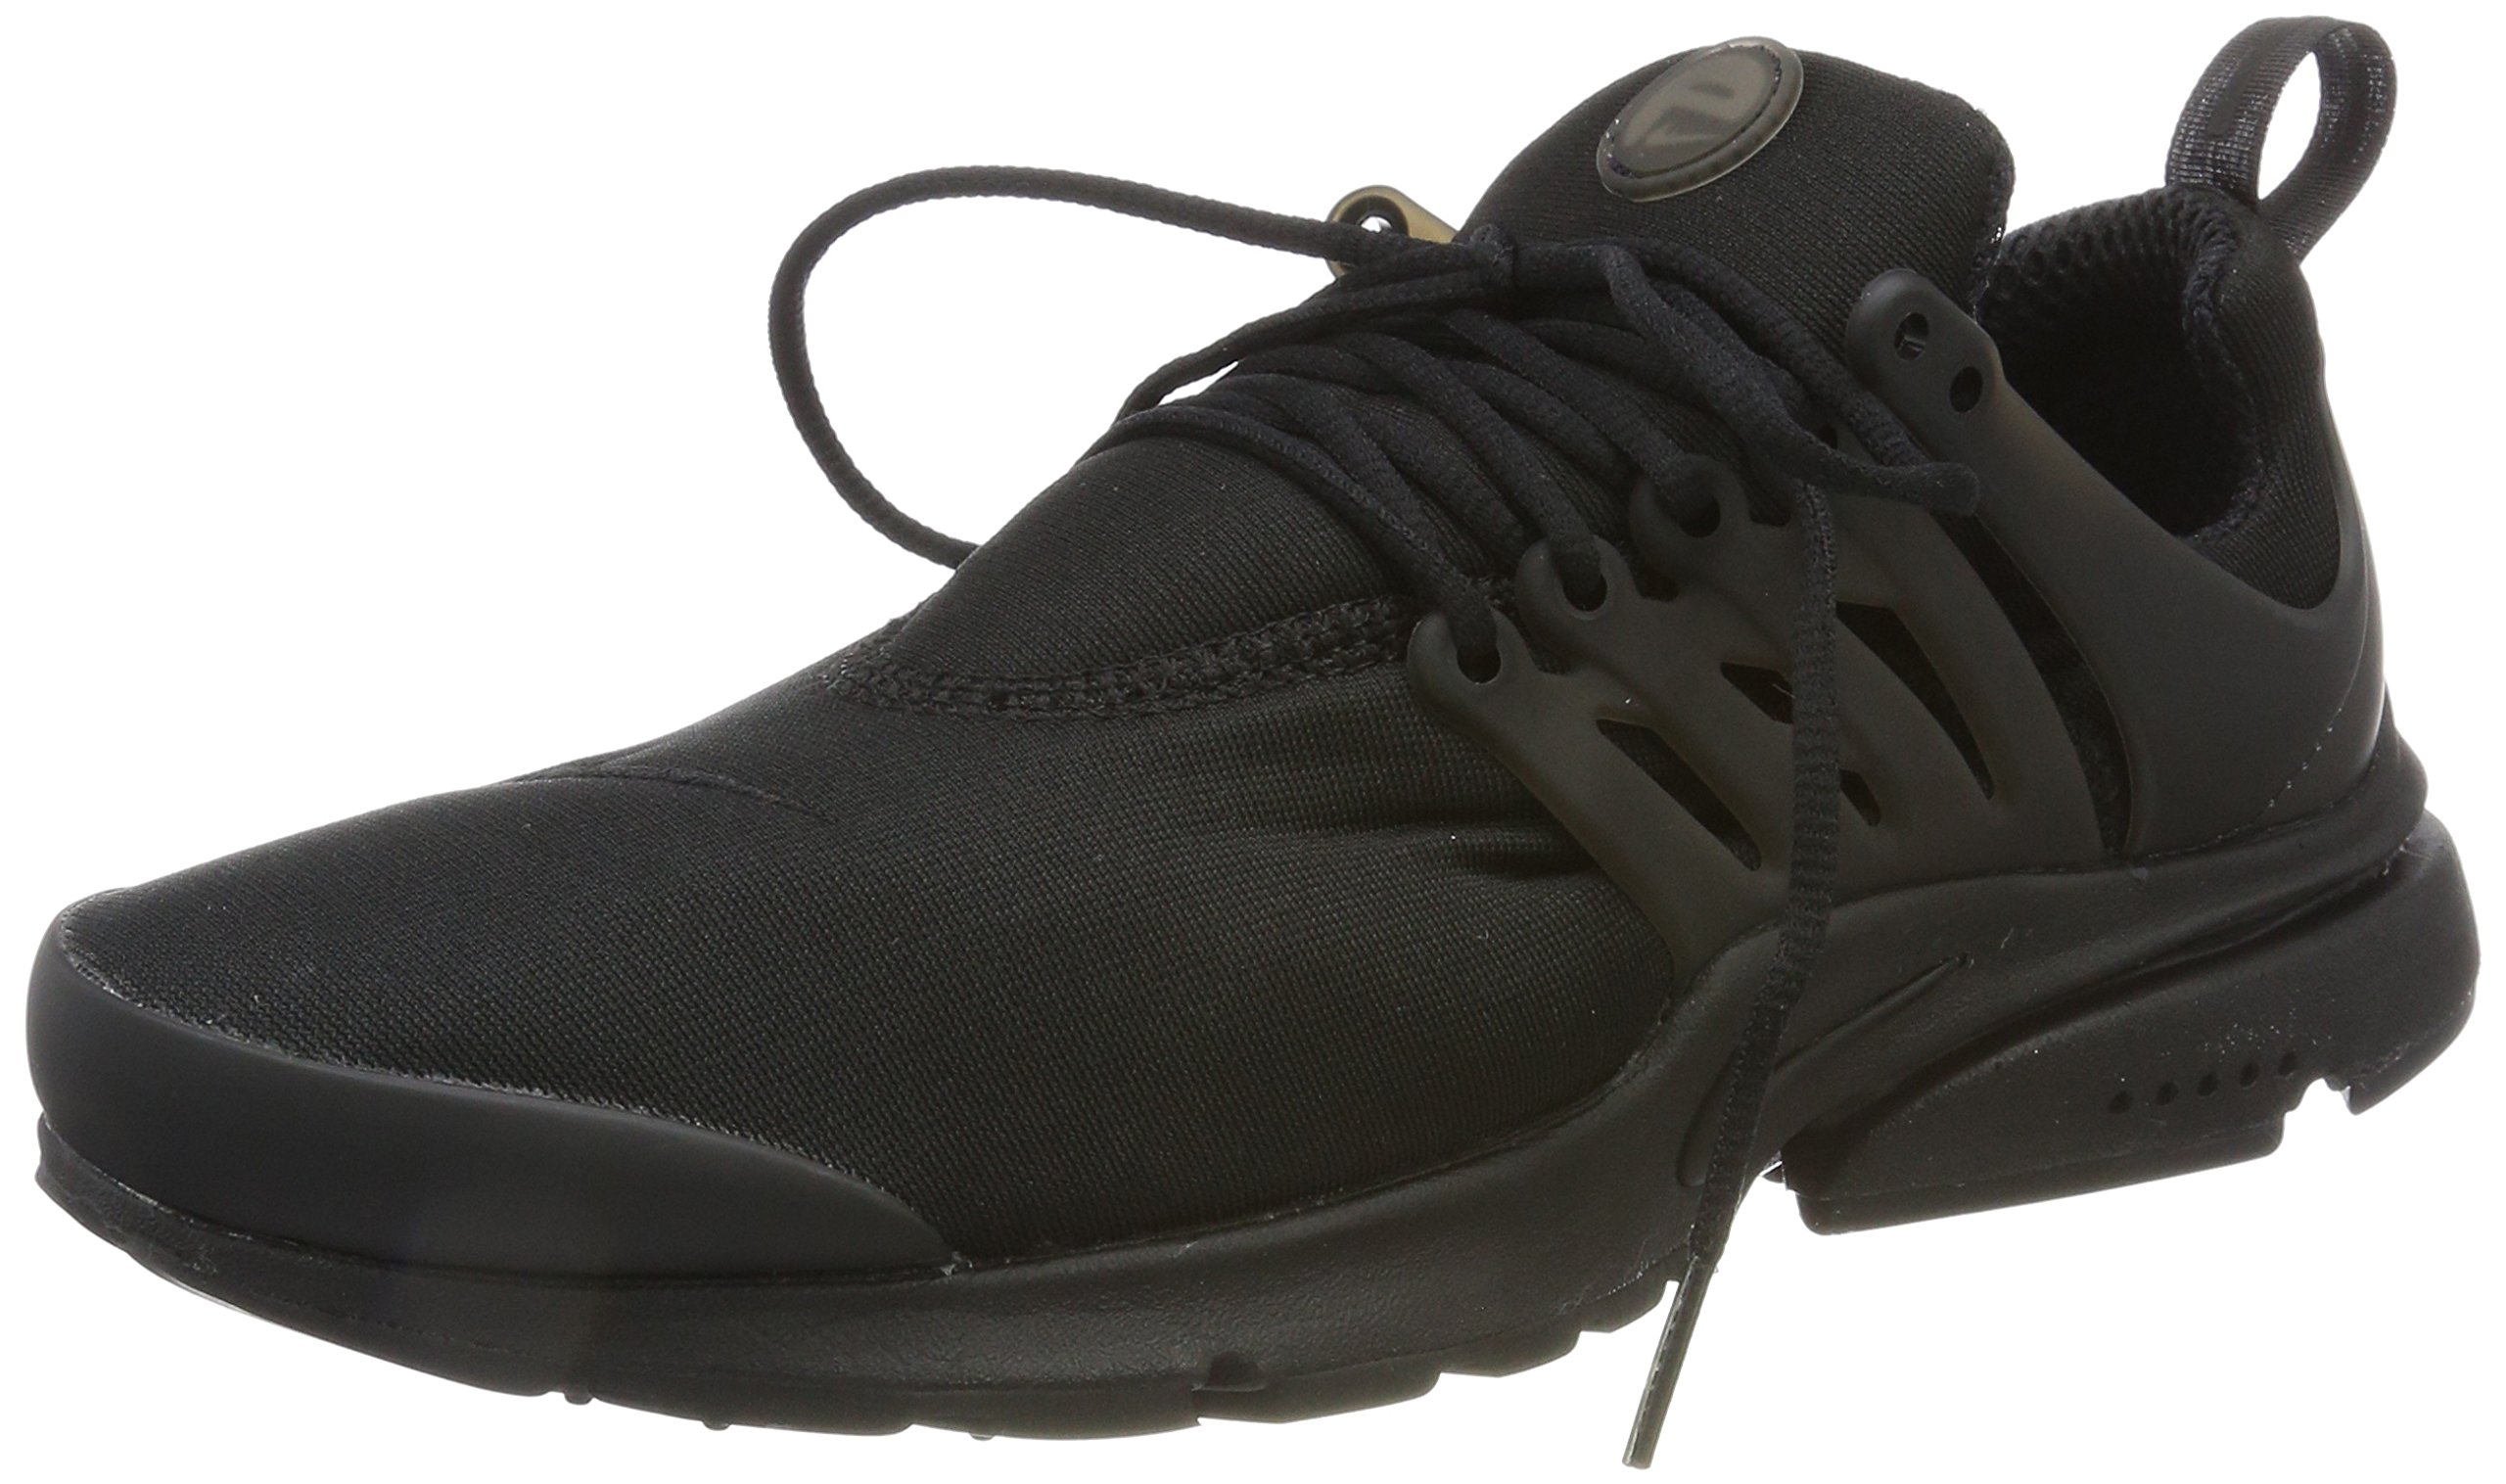 ac9f4996ee10 Galleon - NIKE Air Presto Essential Men s Running Shoe